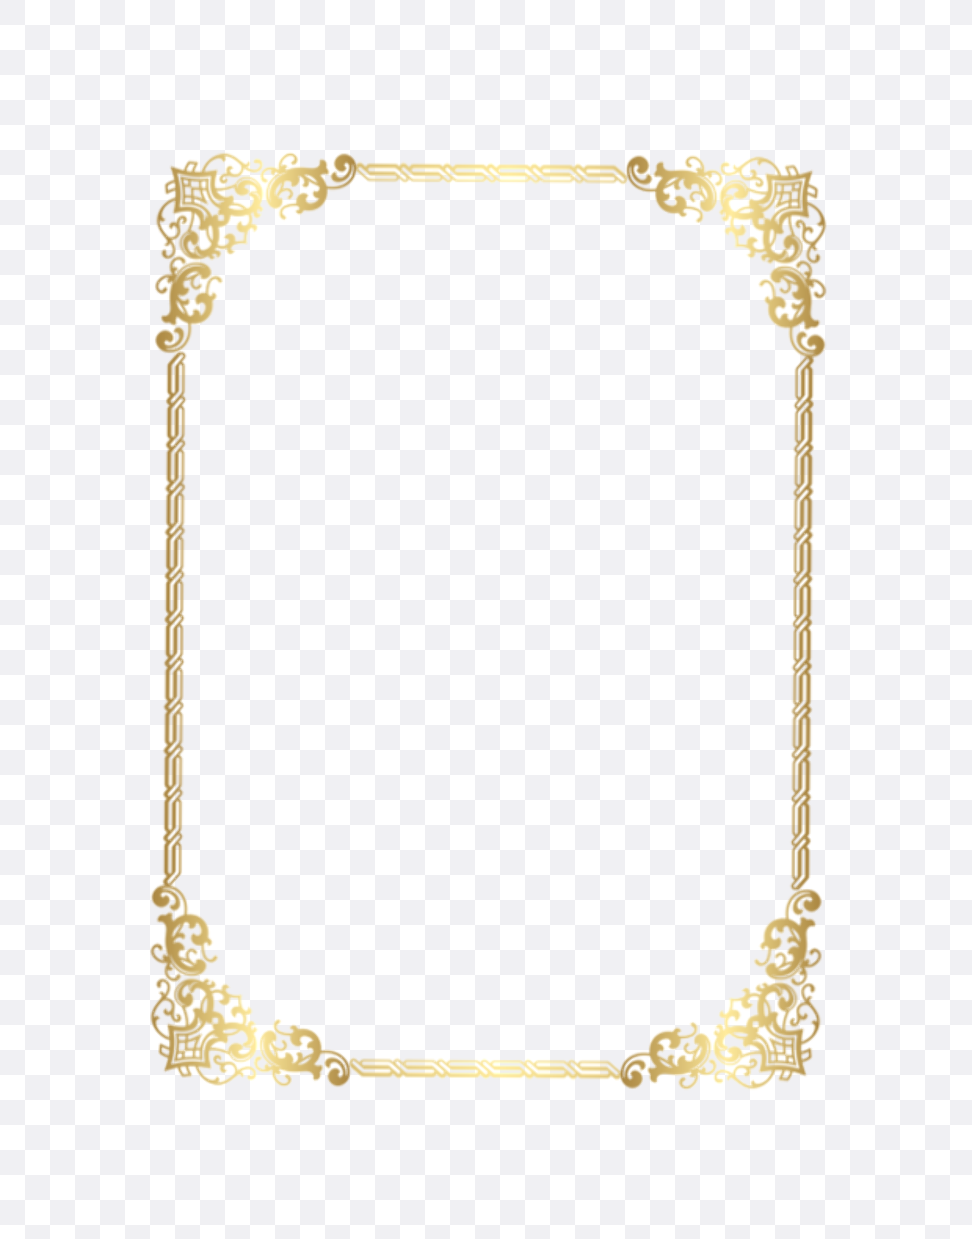 gold borders